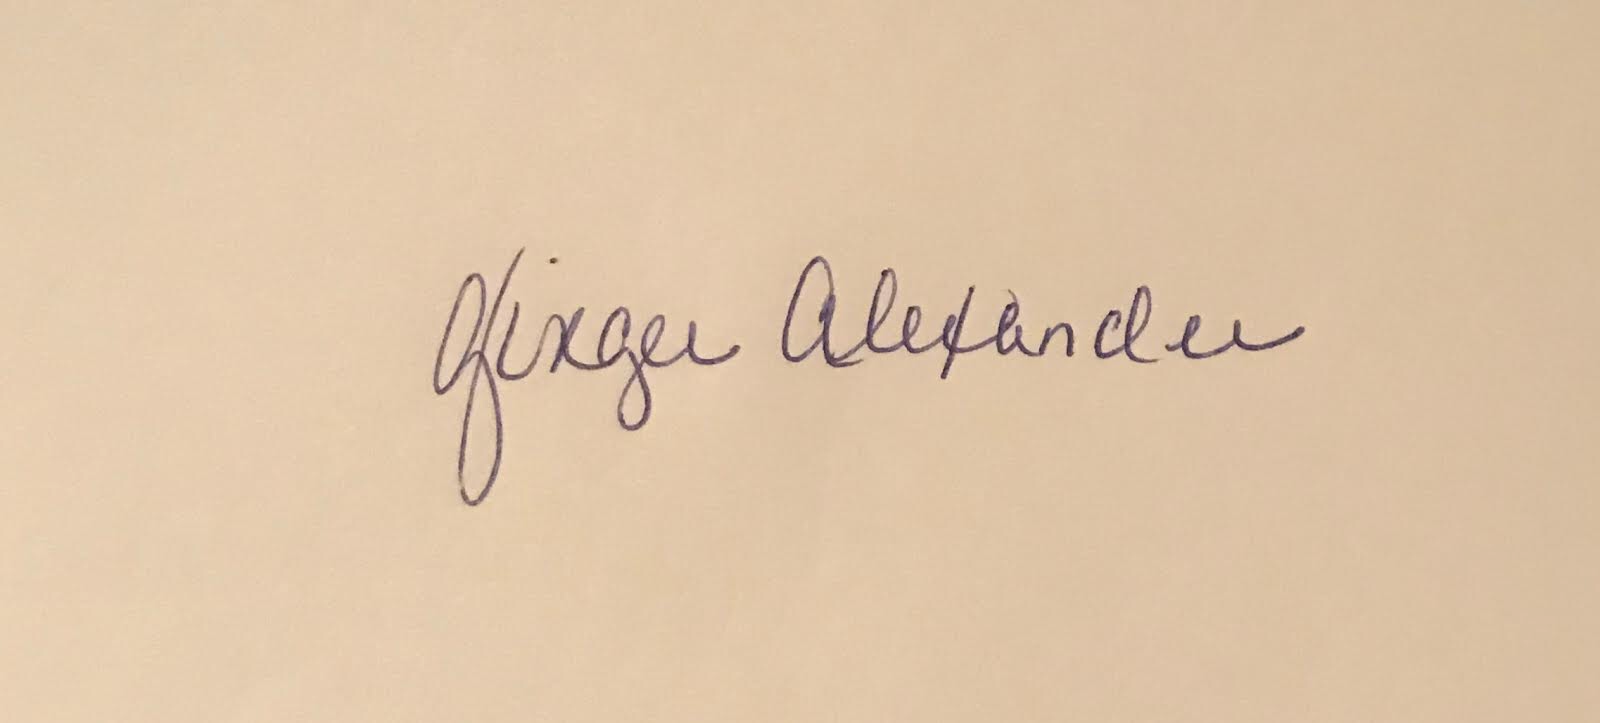 Ginger Alexander's Signature